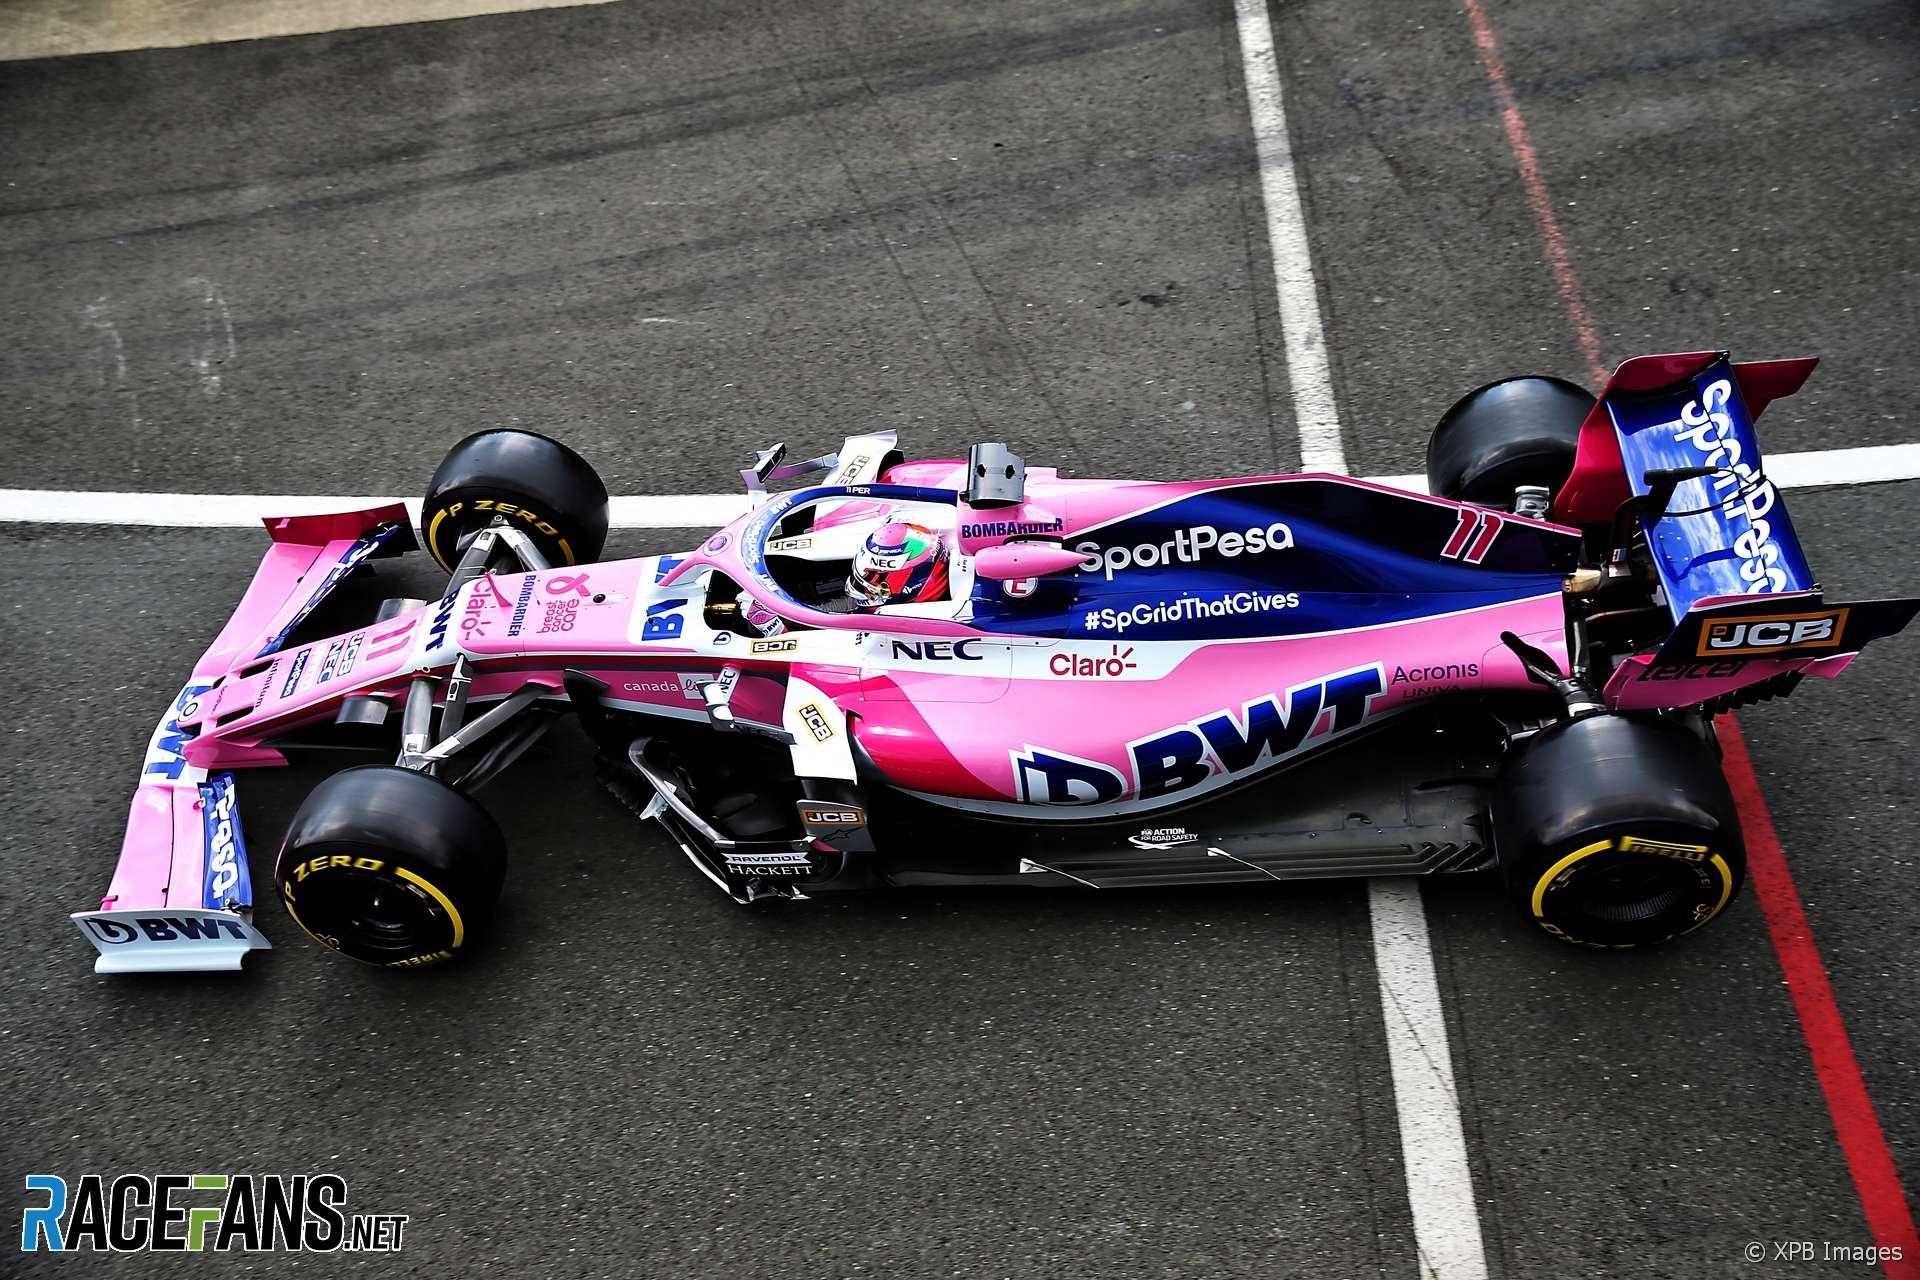 Sergio Perez, Racing Point, Silverstone, 2019